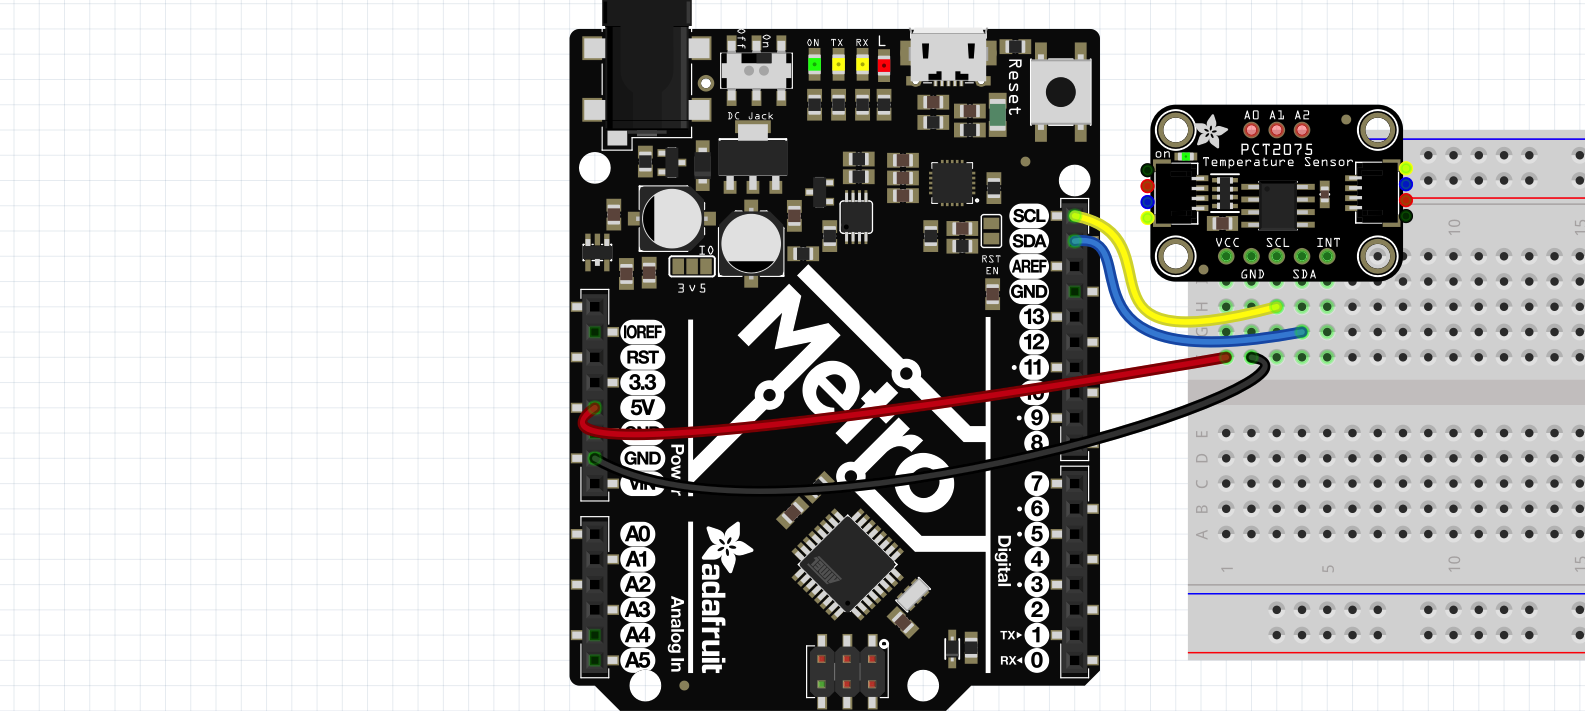 adafruit_products_arduino_breadboard_wiring.png